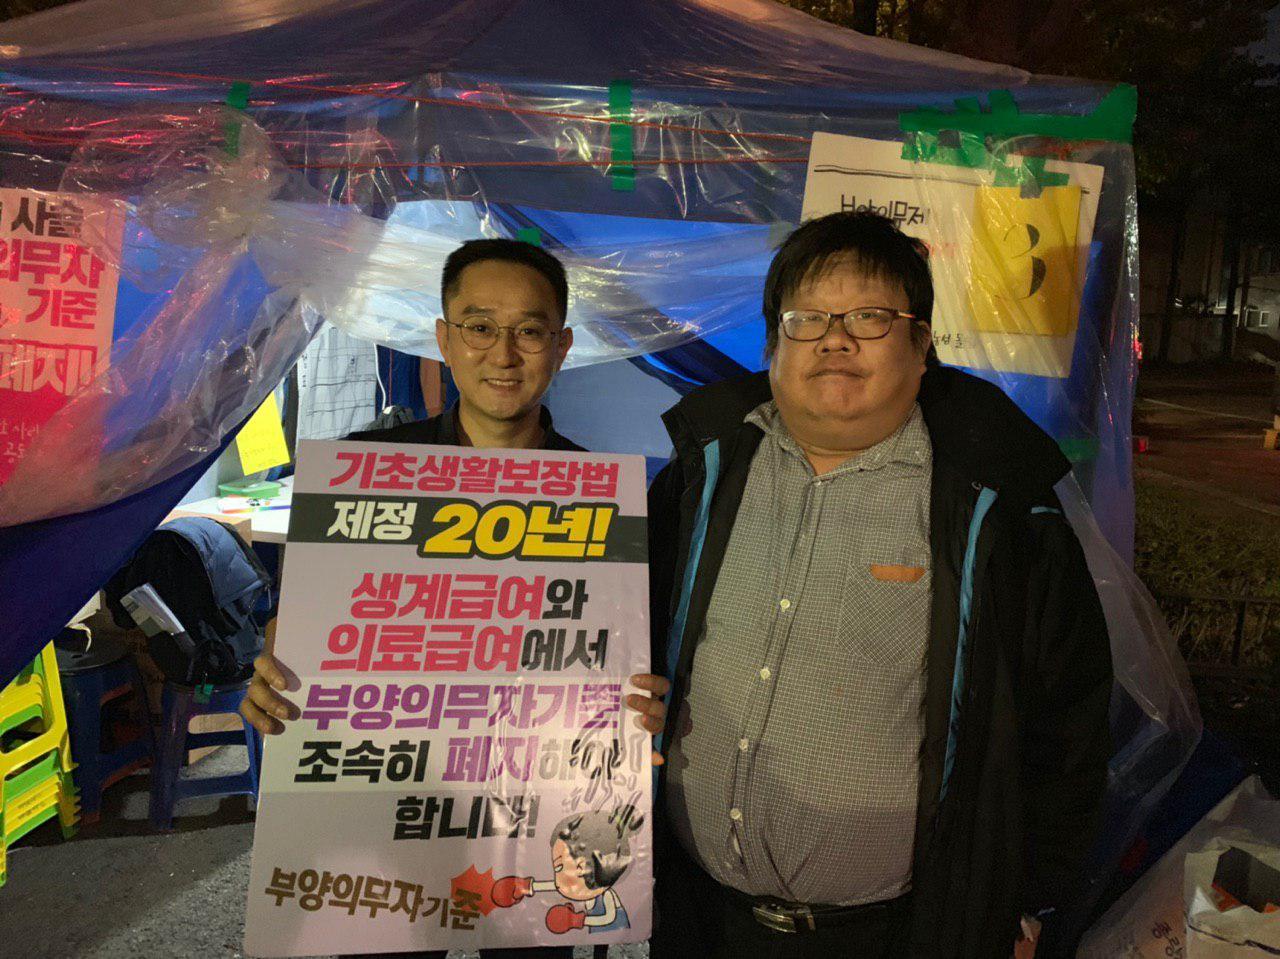 photo_2019-10-20_12-46-59.jpg